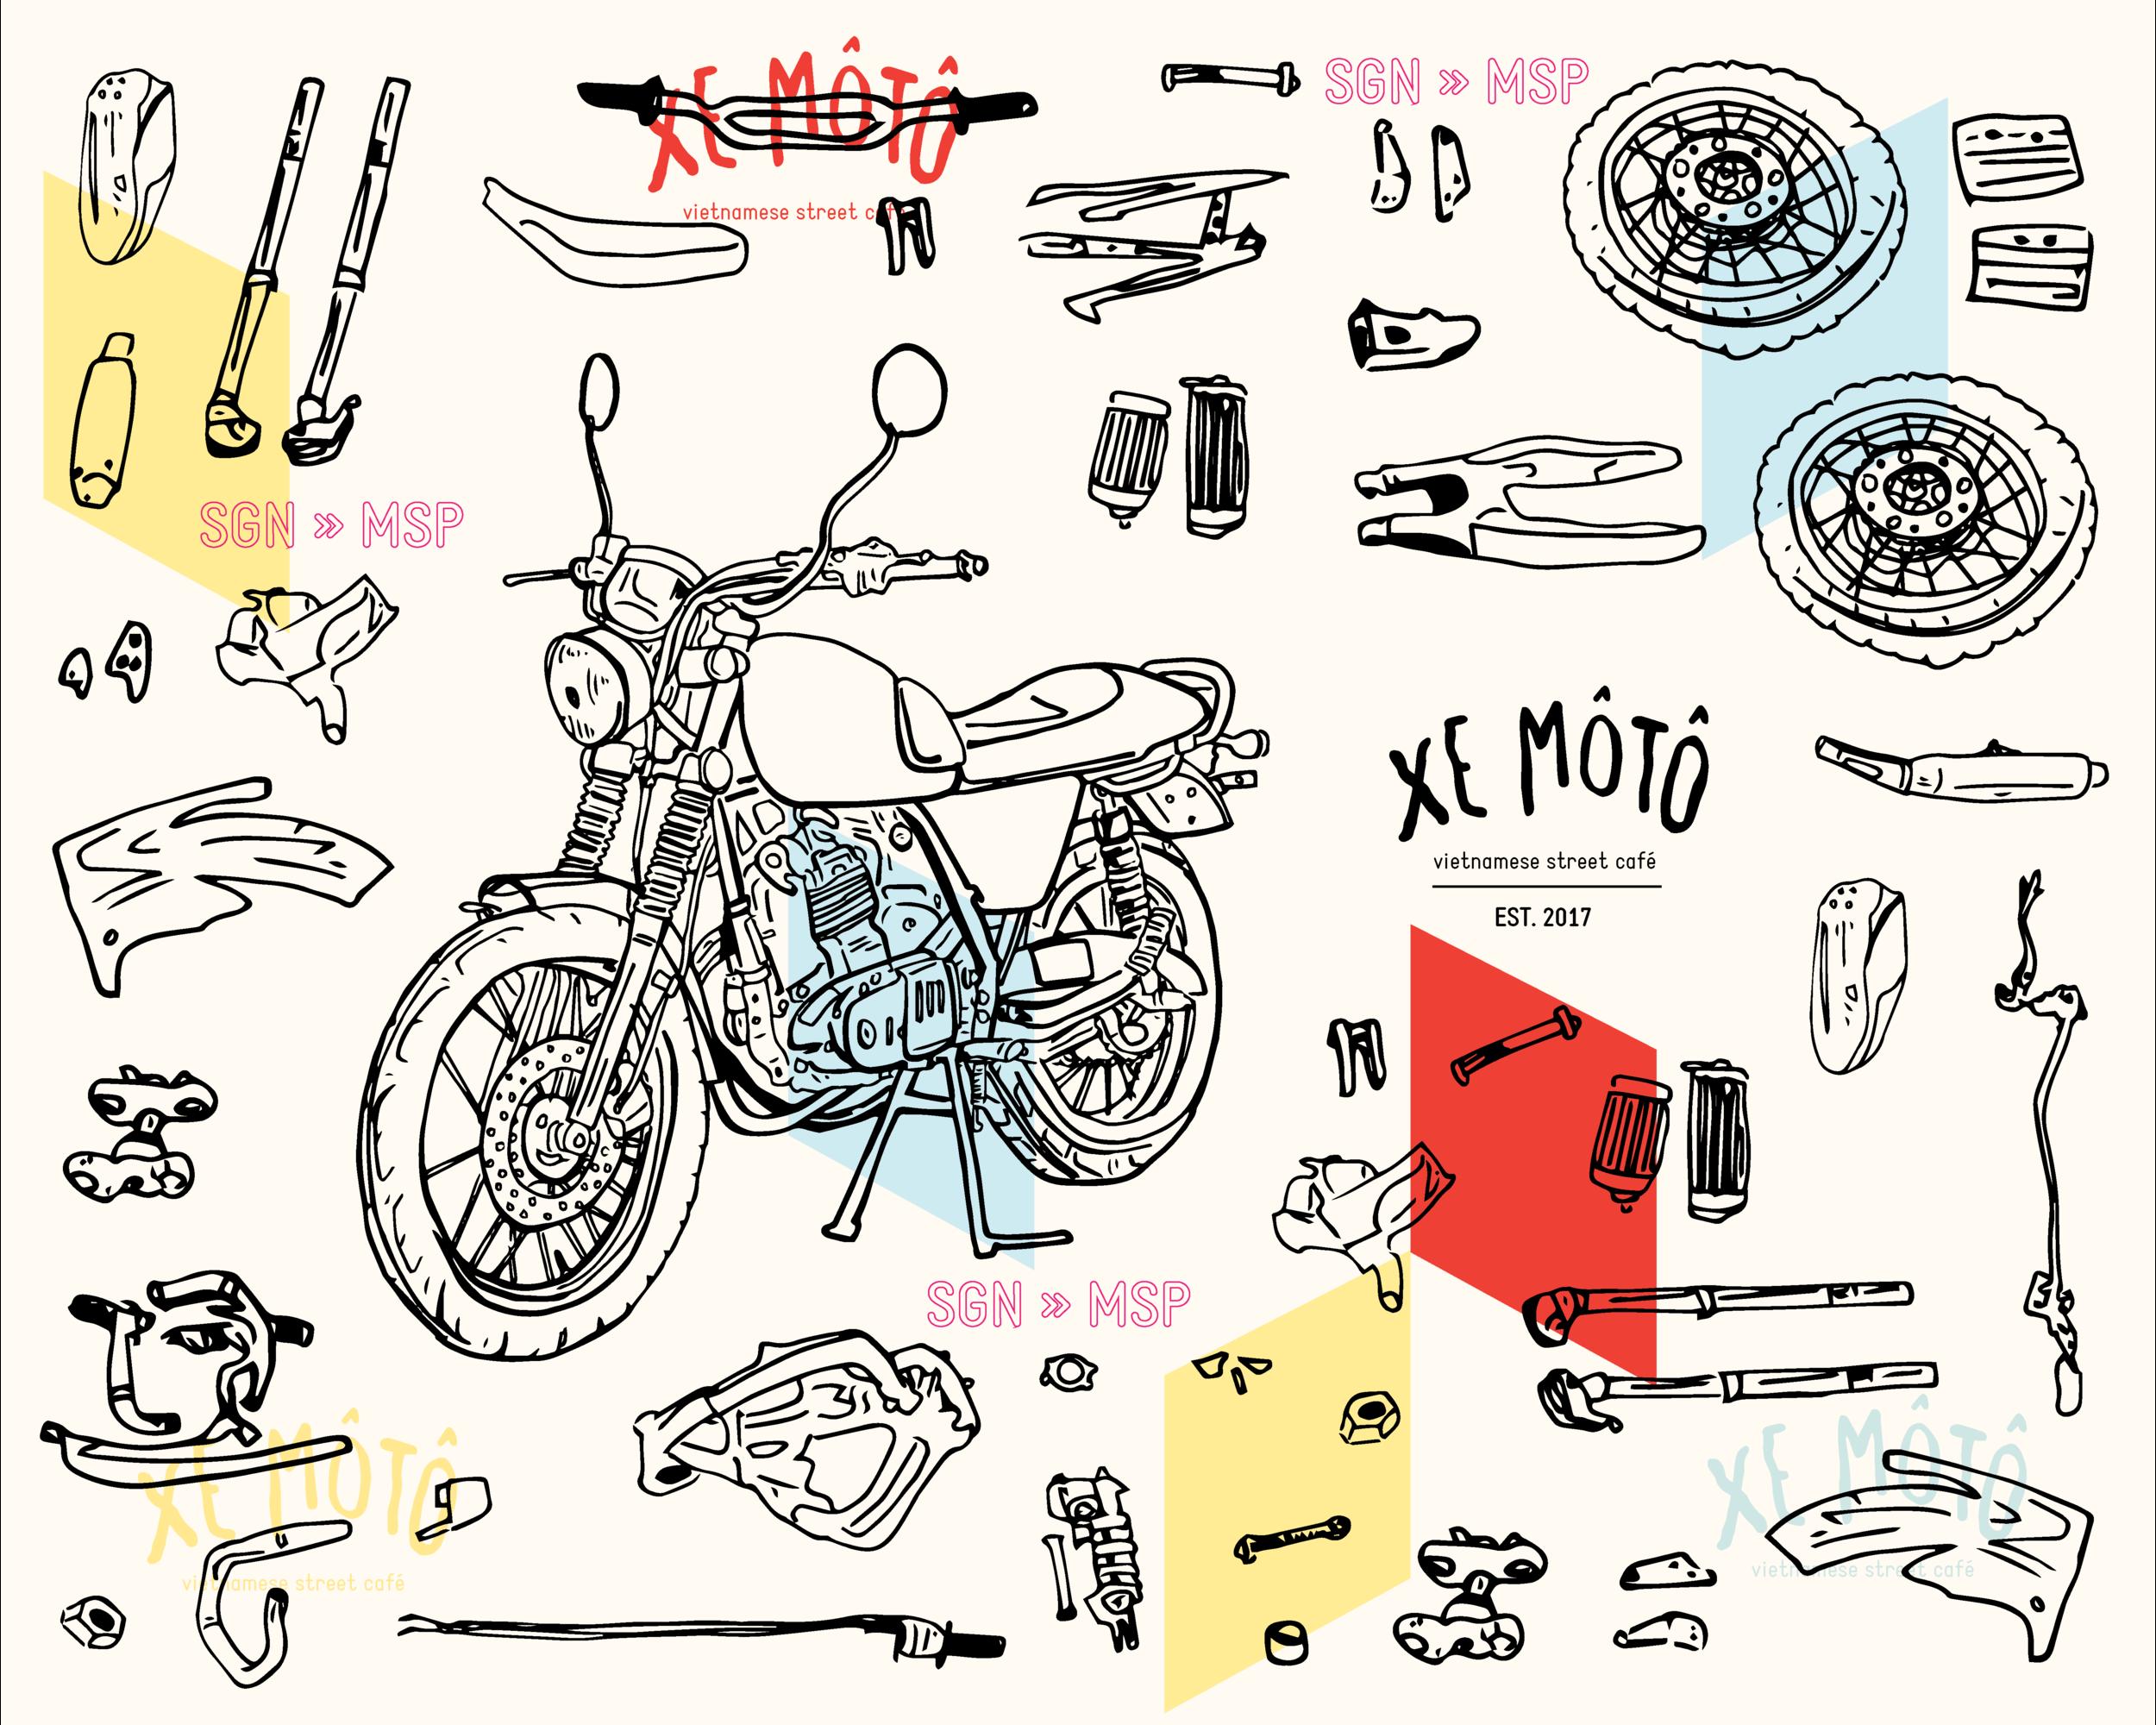 xe moto - wrap2.jpg